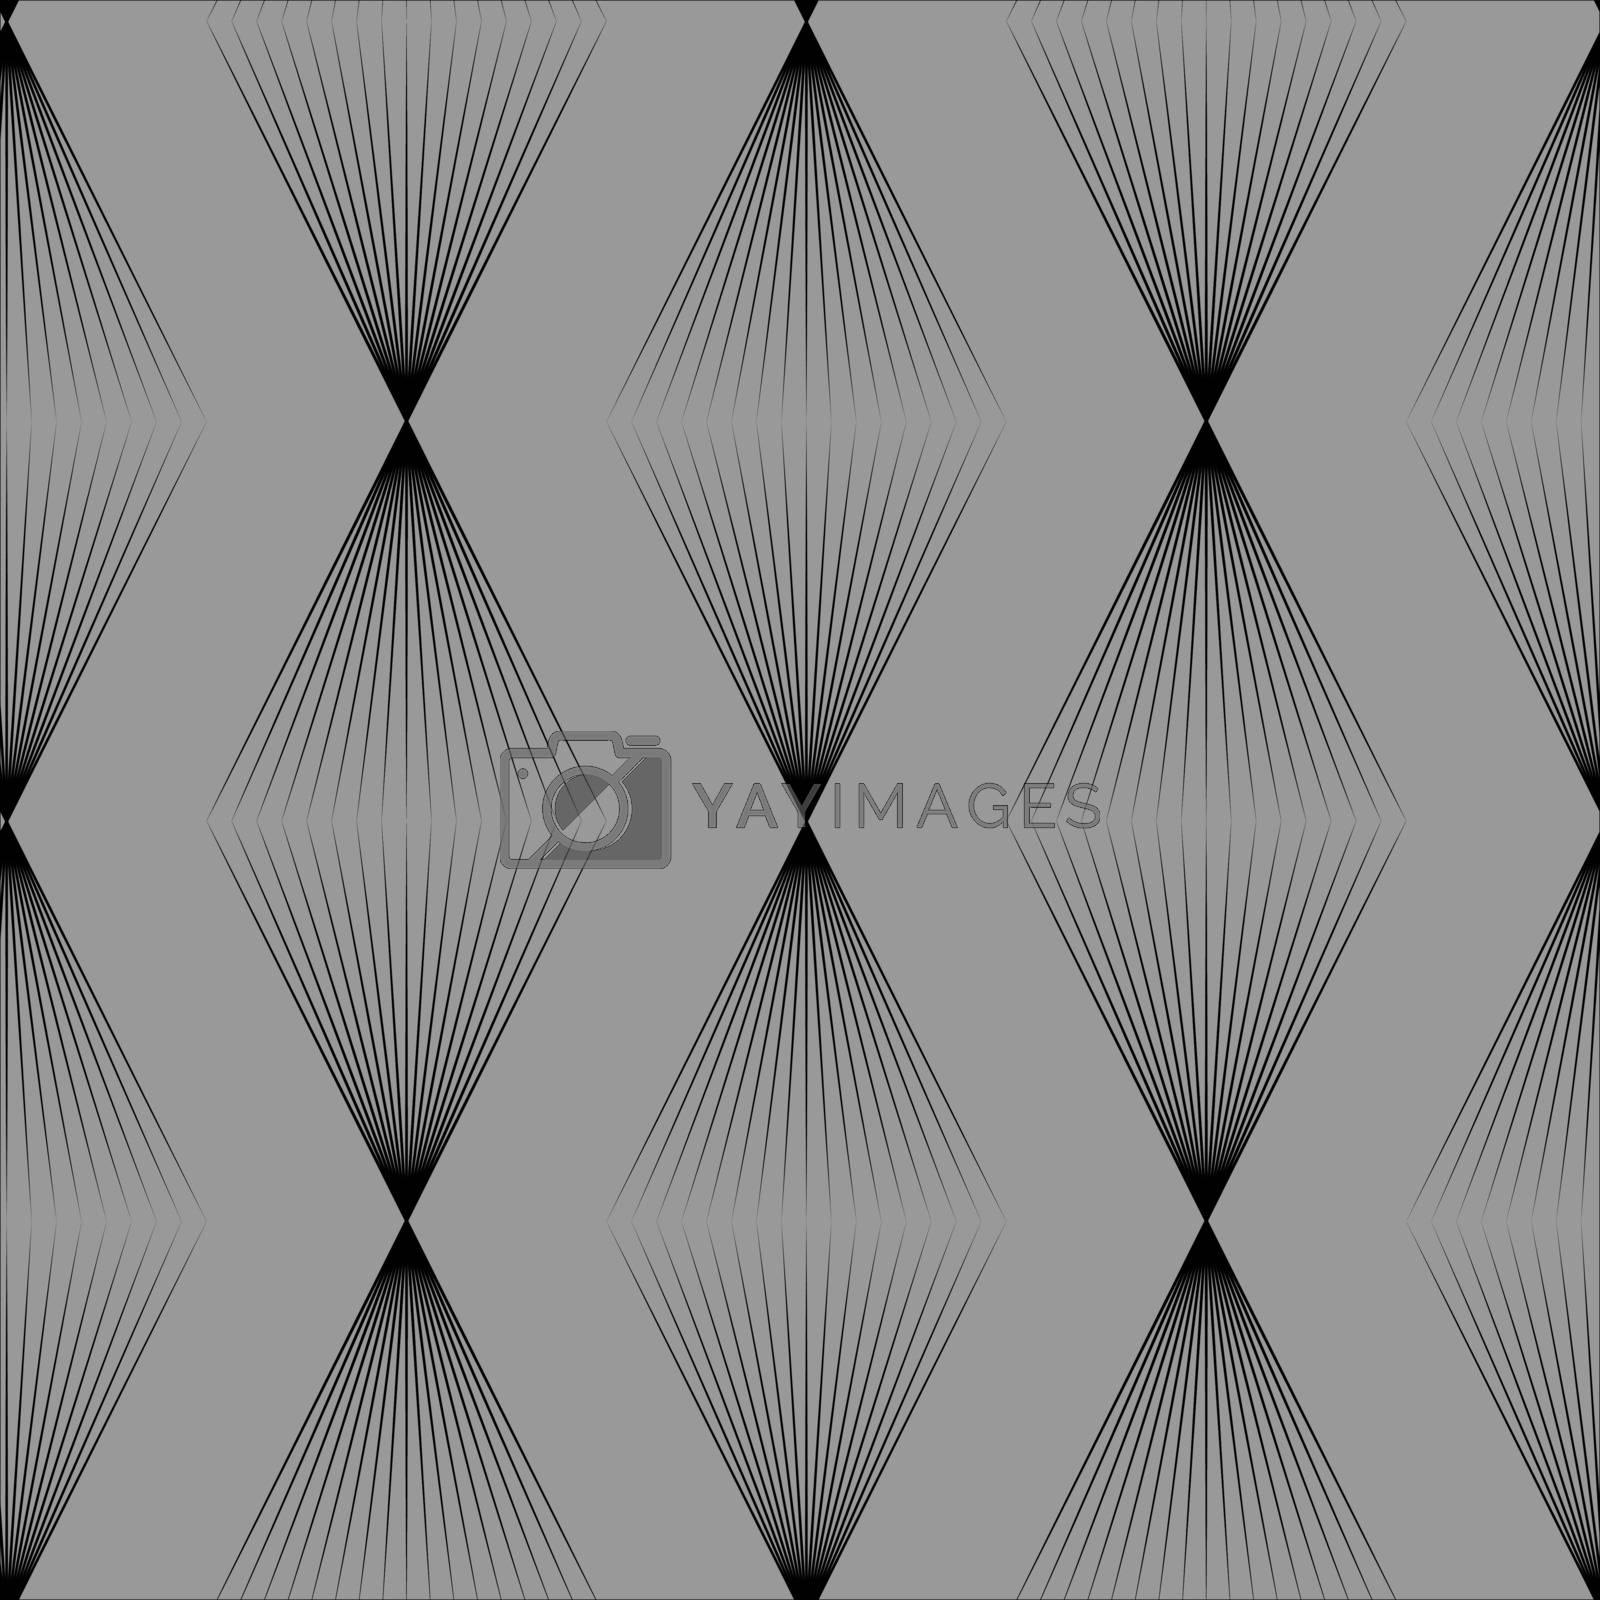 Elegant minimal grey seamless pattern with thin black linear rhombuses